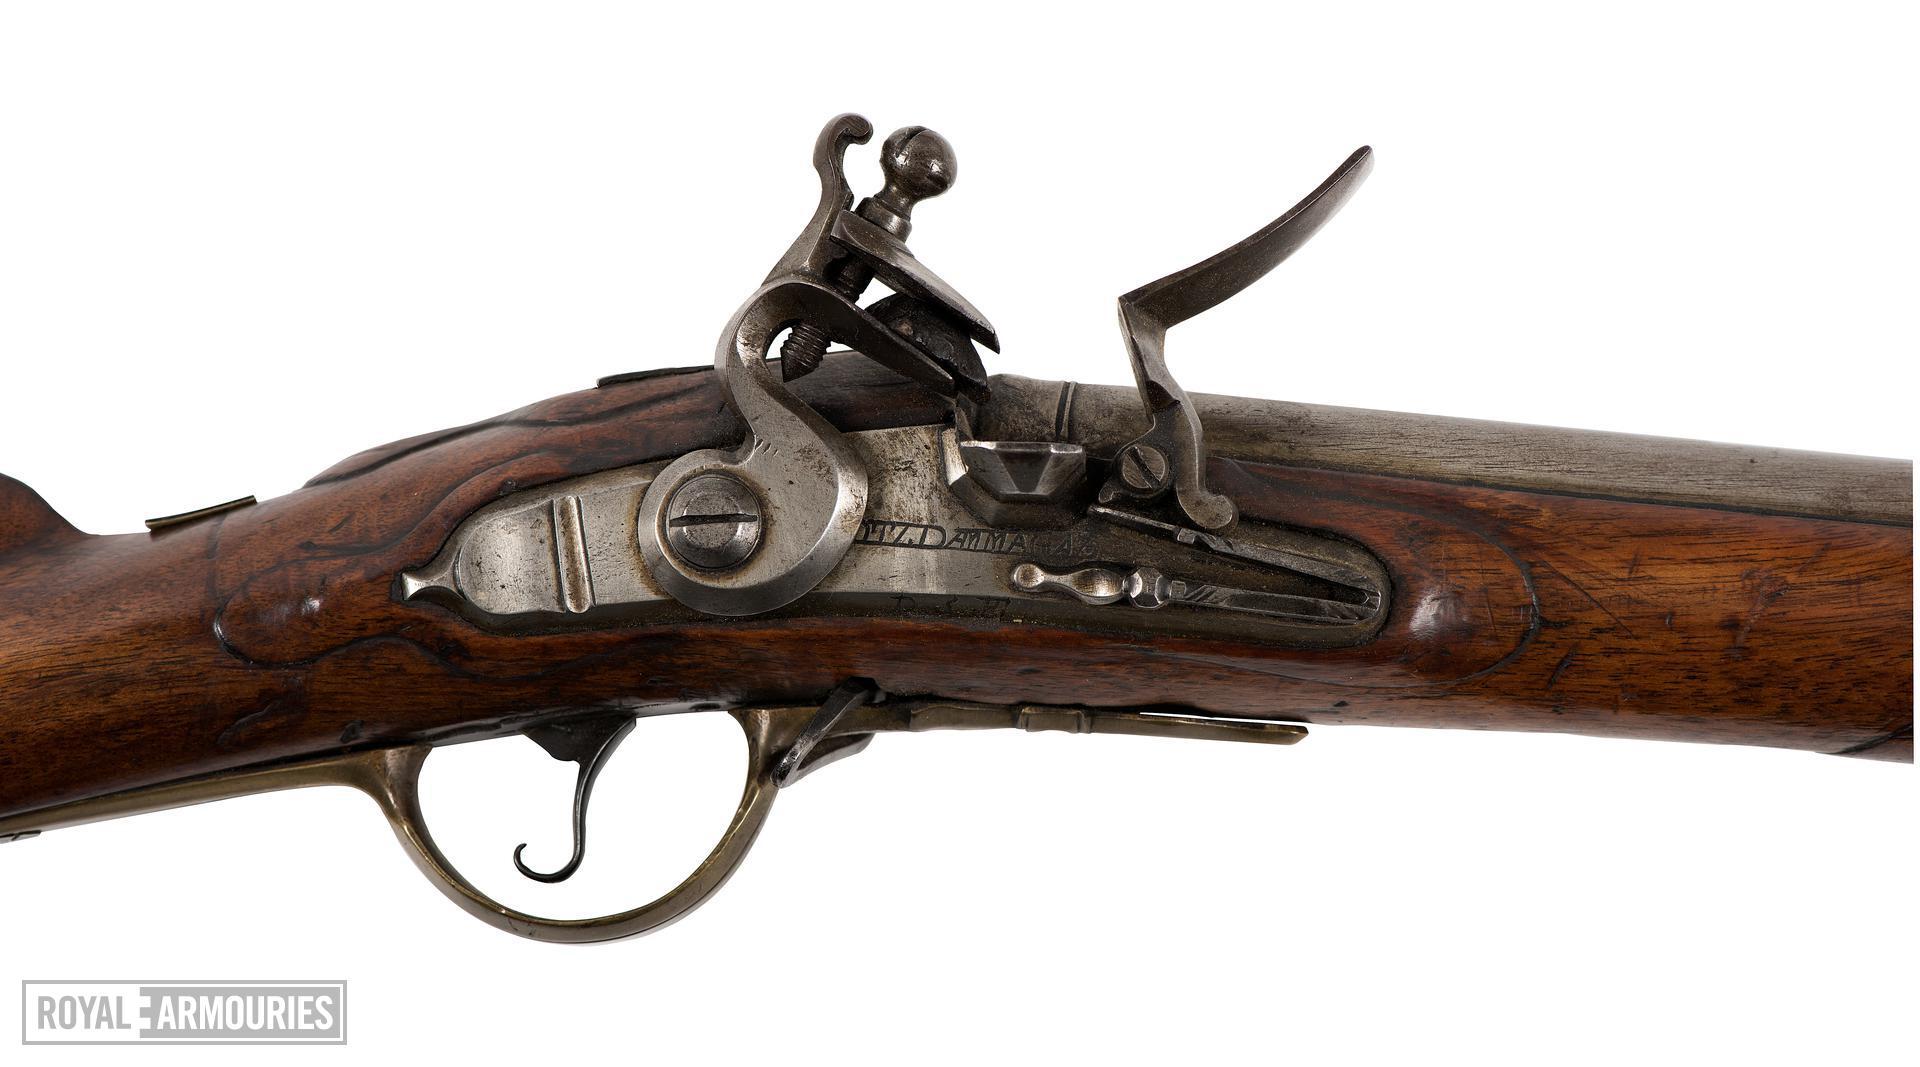 Flintlock muzzle-loading military rifle-musket - Fusillier Model 1787 (Modified in 1796)